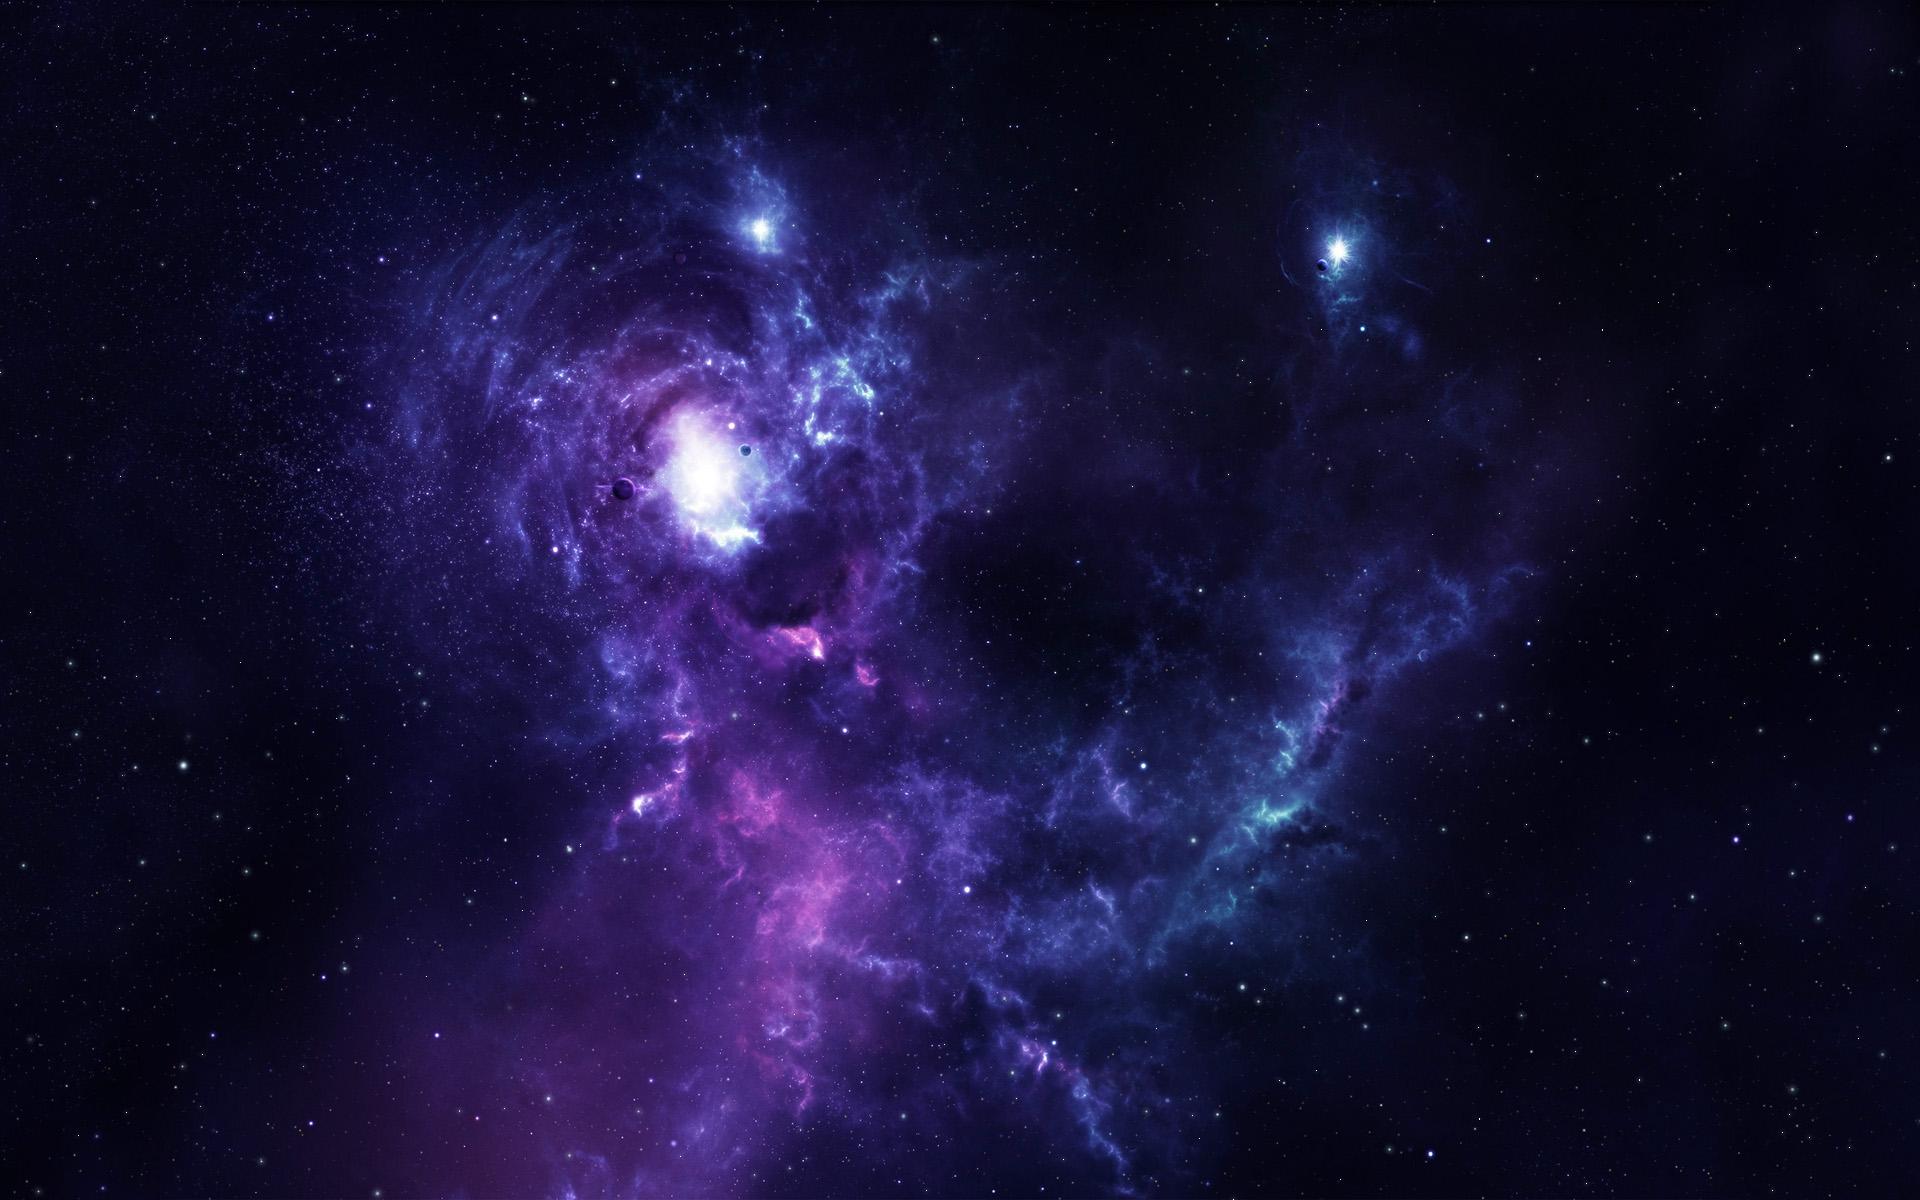 Evera Nebula by Smattila